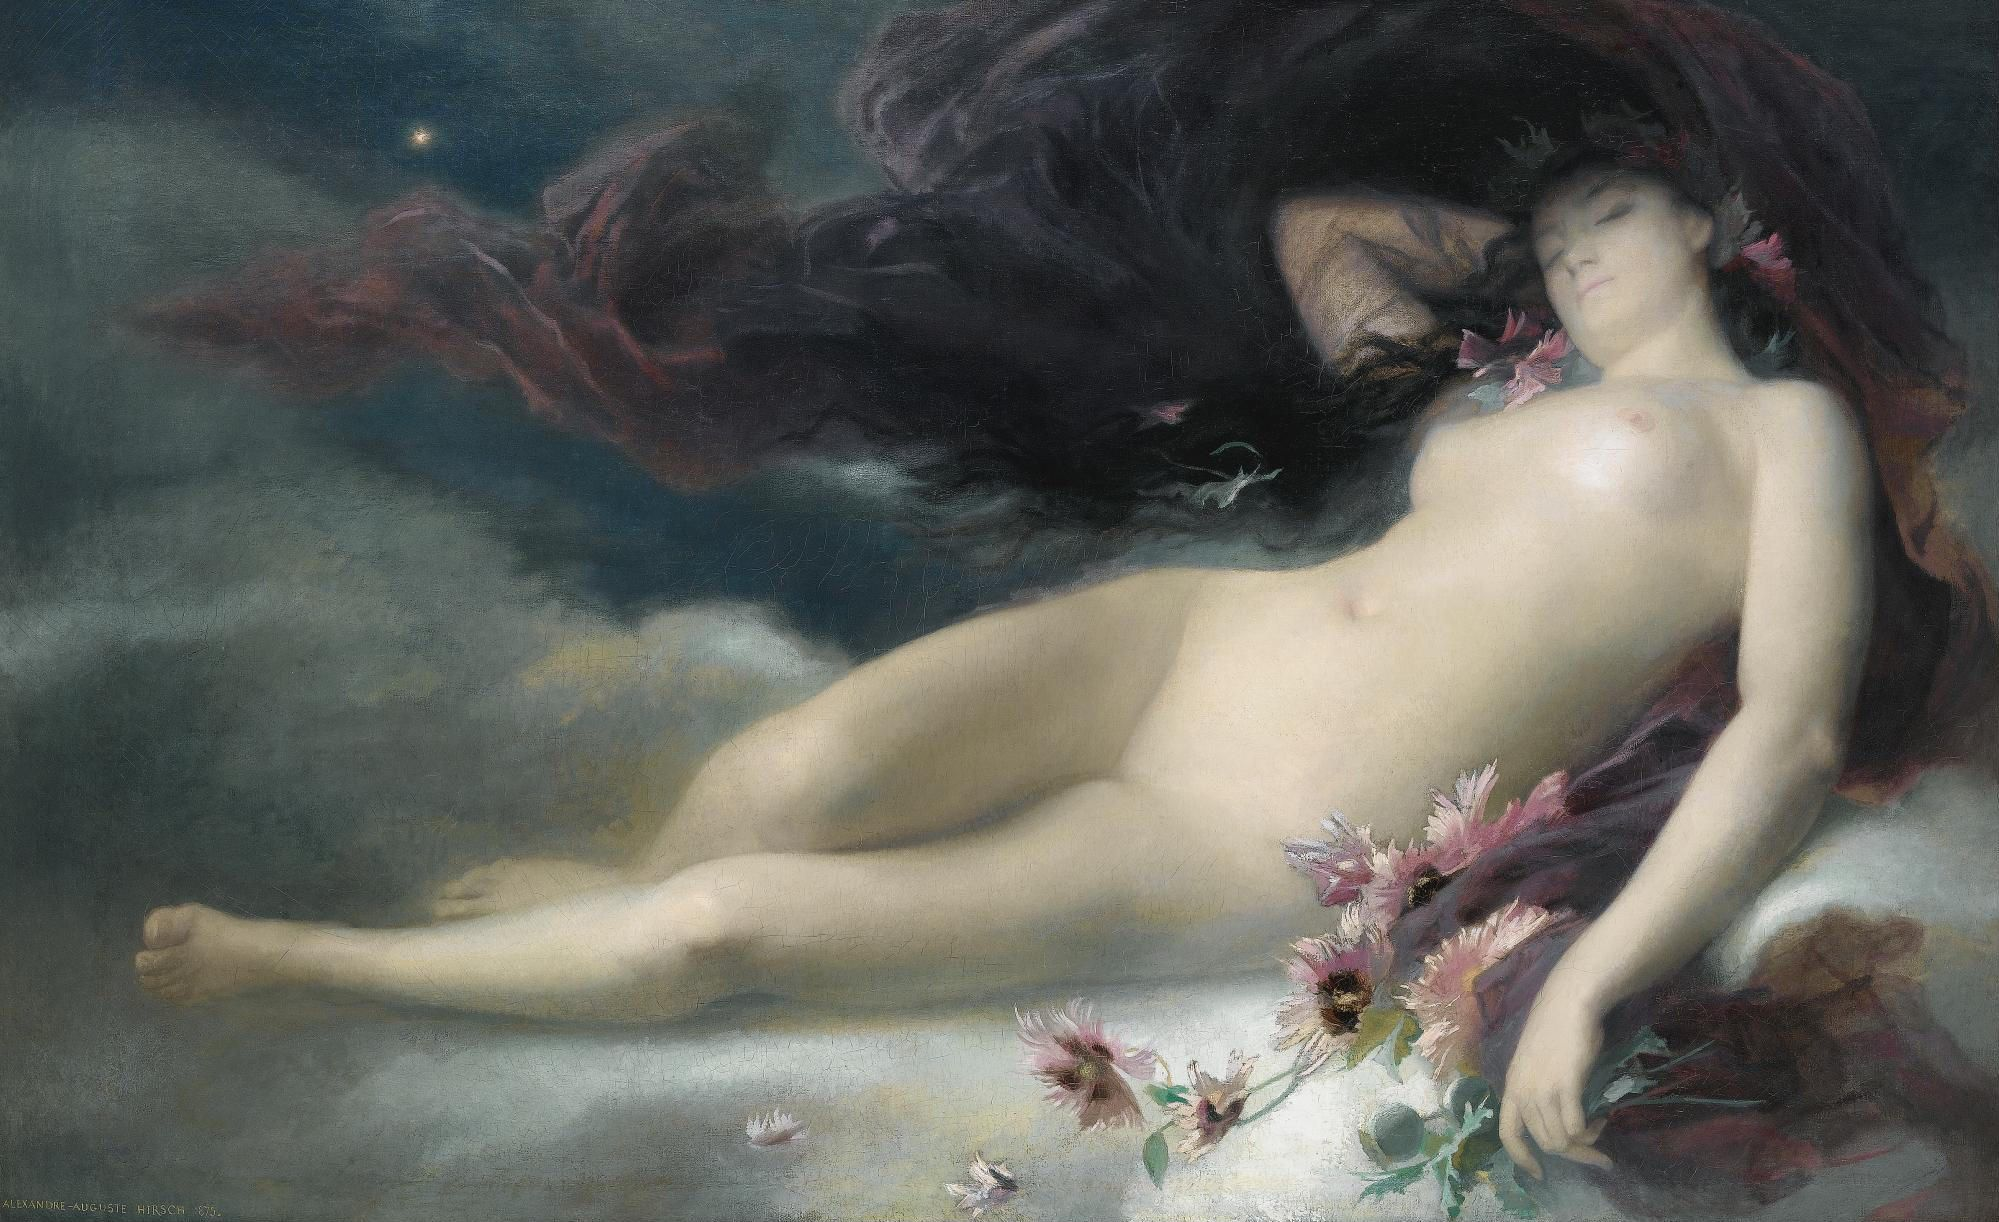 Auguste-Alexandre Hirsch, 1833-1912. Ночь. 105 х 168 см. Частная коллекция